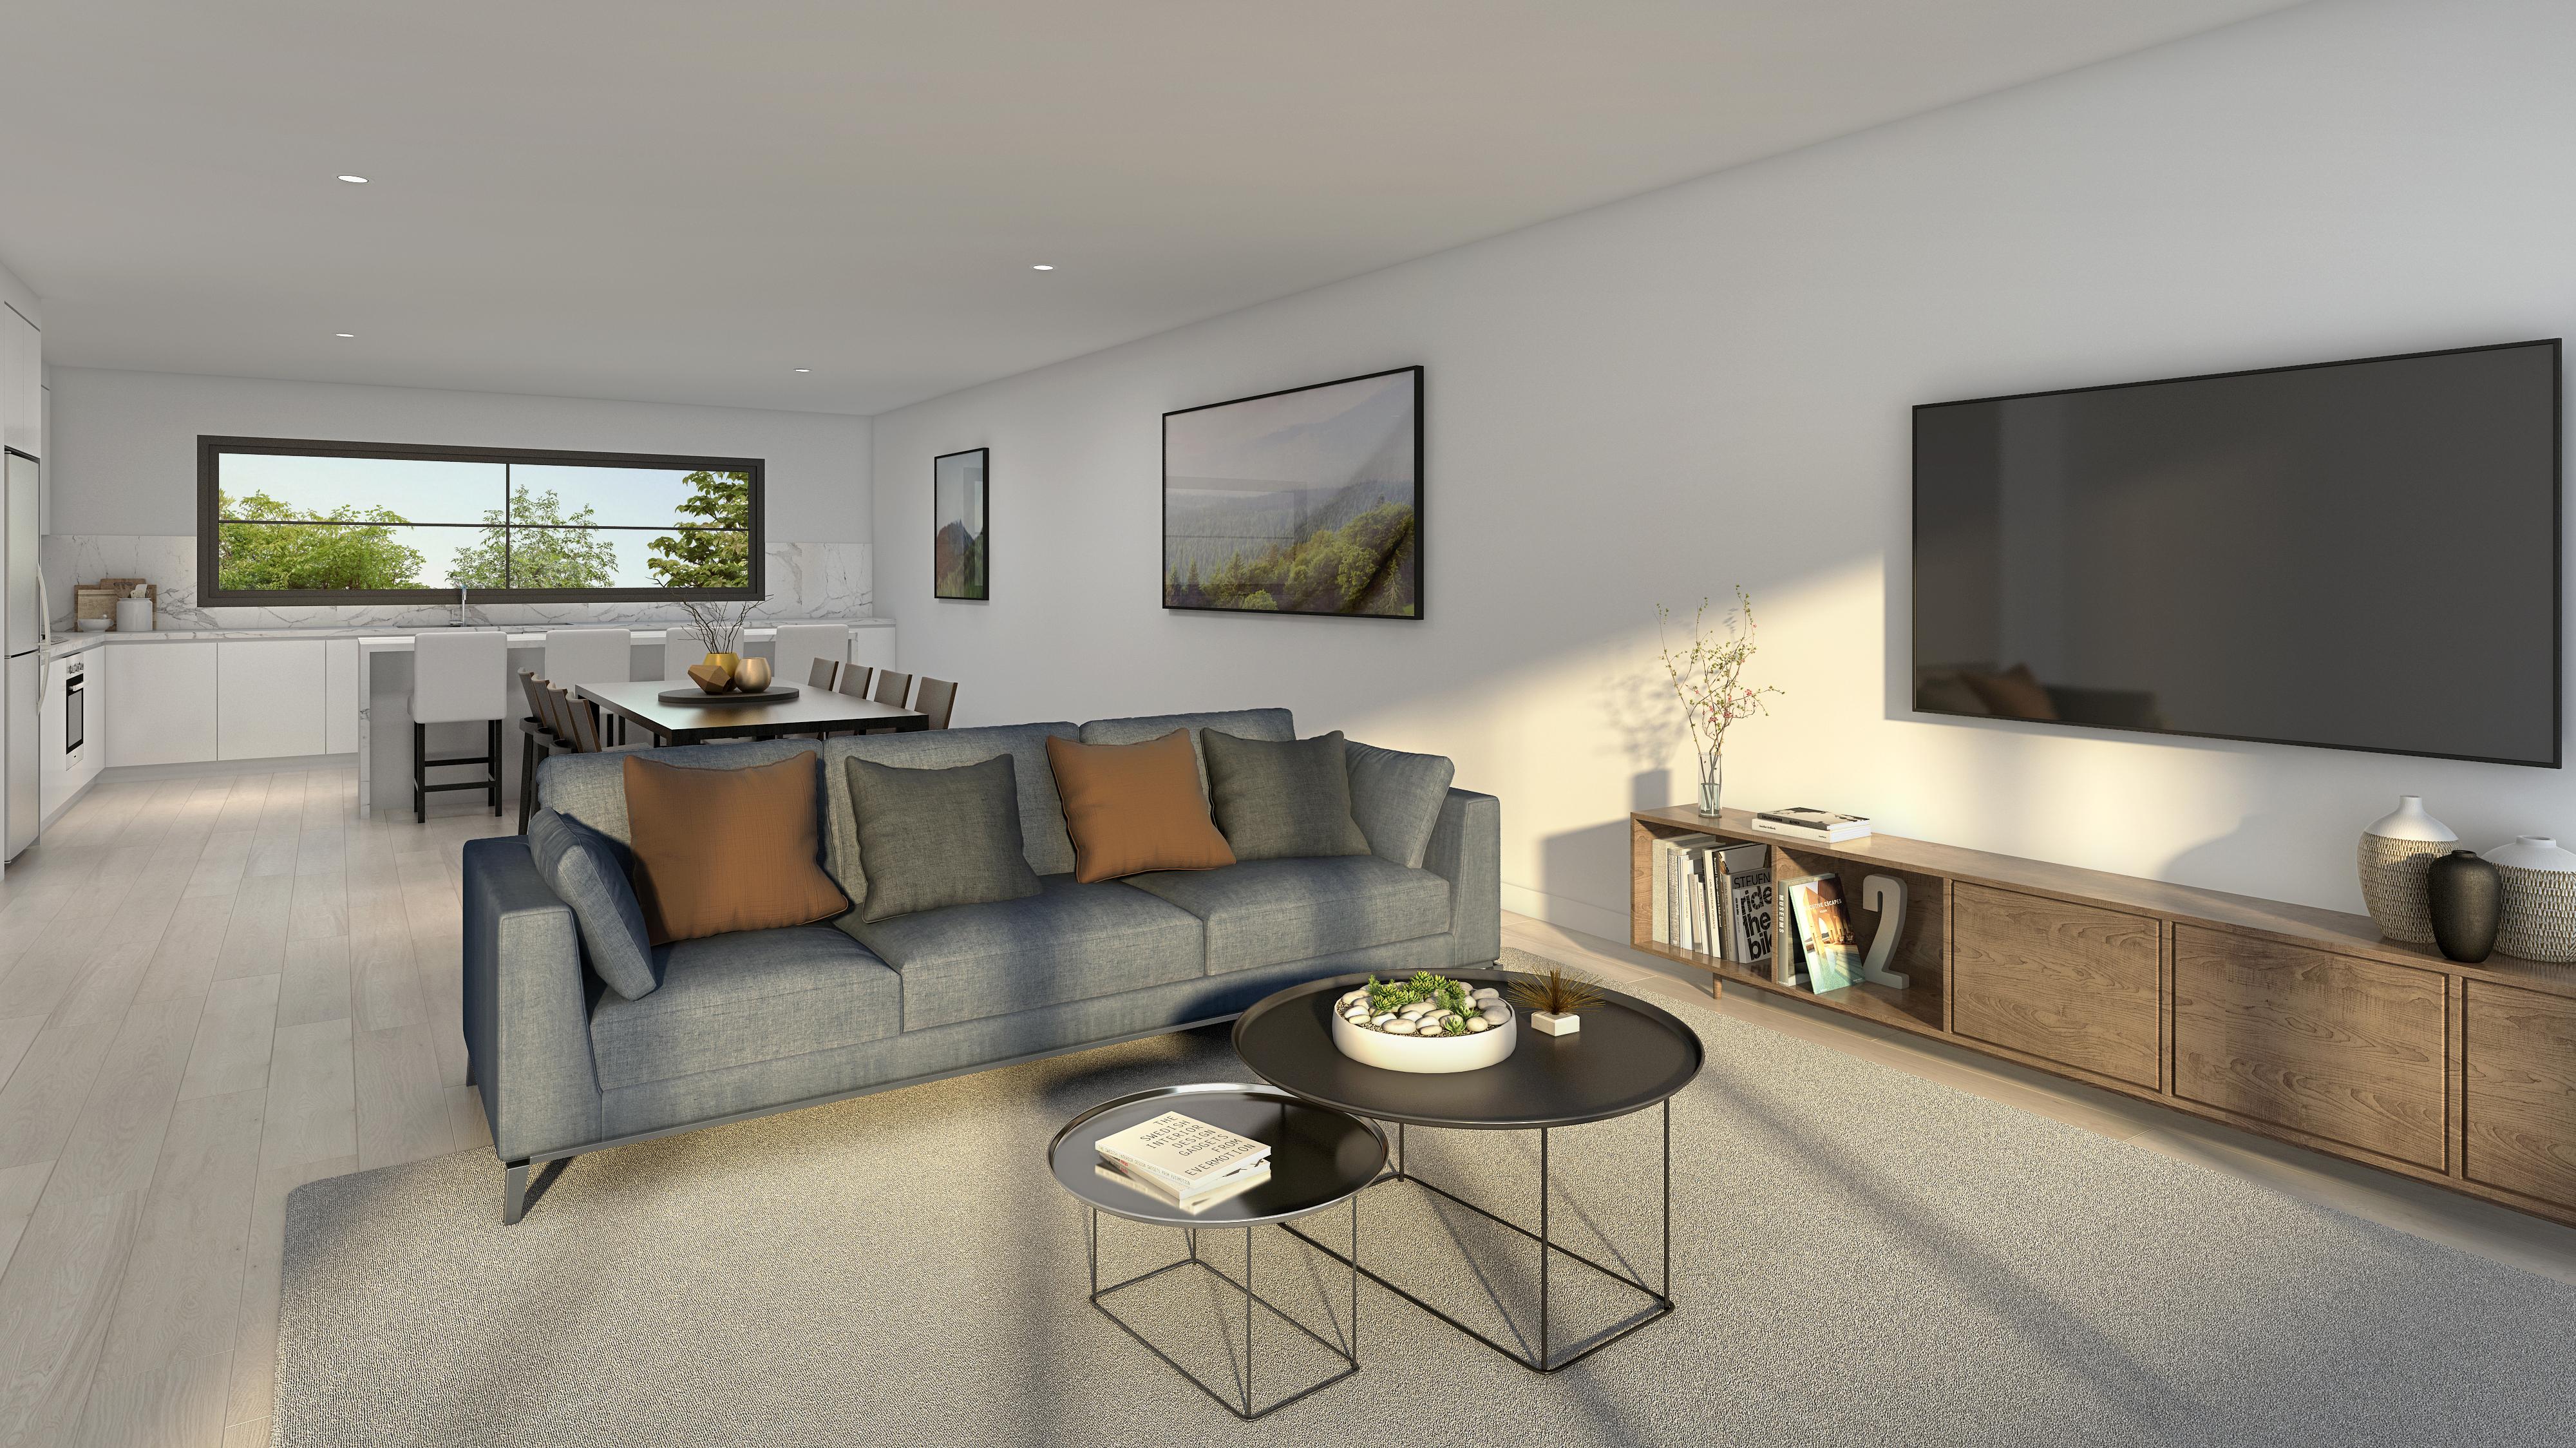 3 6354 livingroom 02